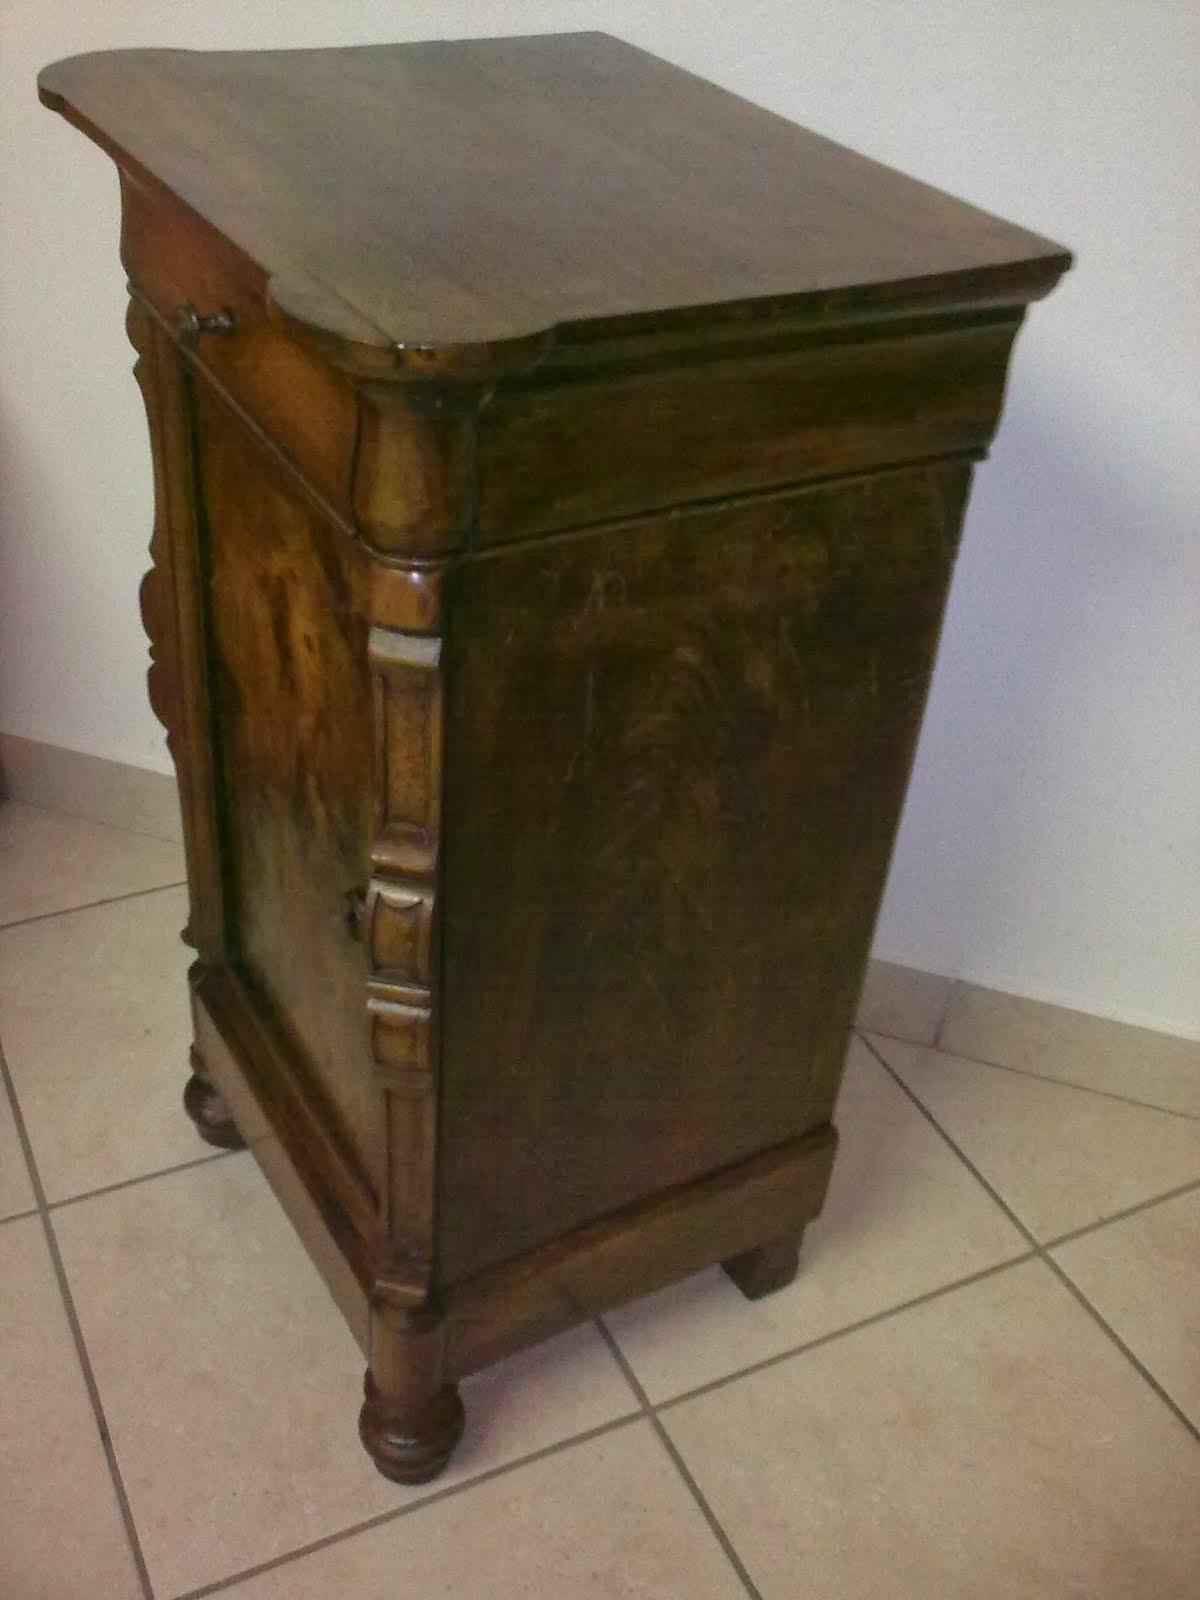 Restauro fai da te restauro mobili impiallacciati - Restauro mobili impiallacciati ...